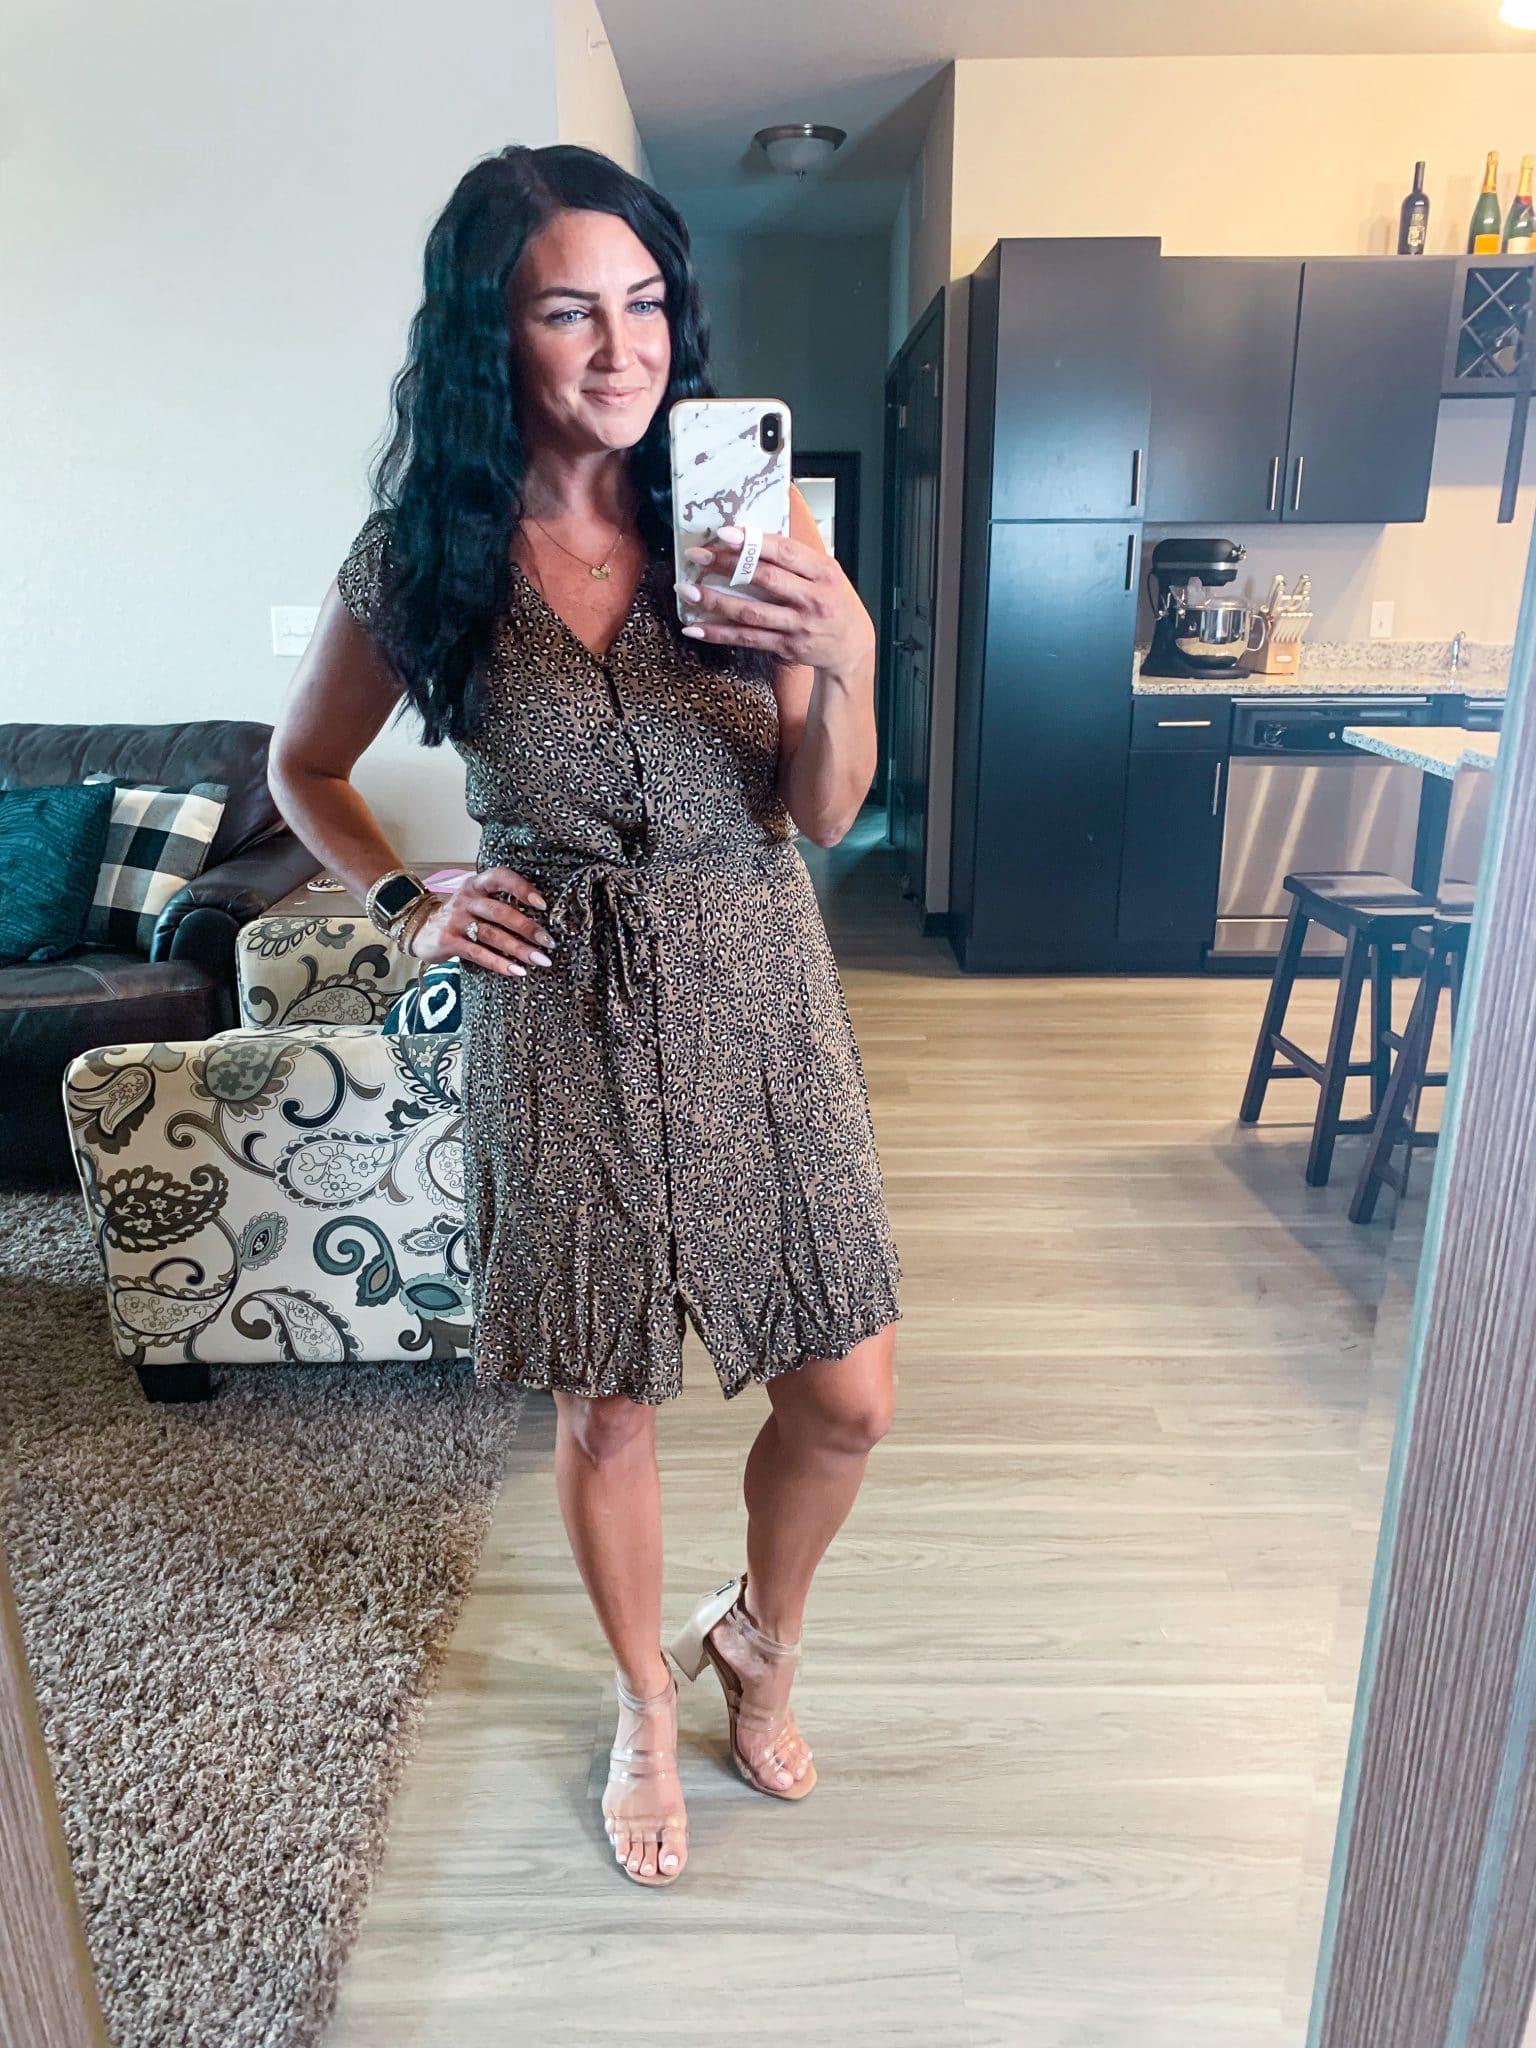 Leopard Dress, Amazon fashion Finds, #founditonamazon, Stilettos and Diapers, Molly Wey